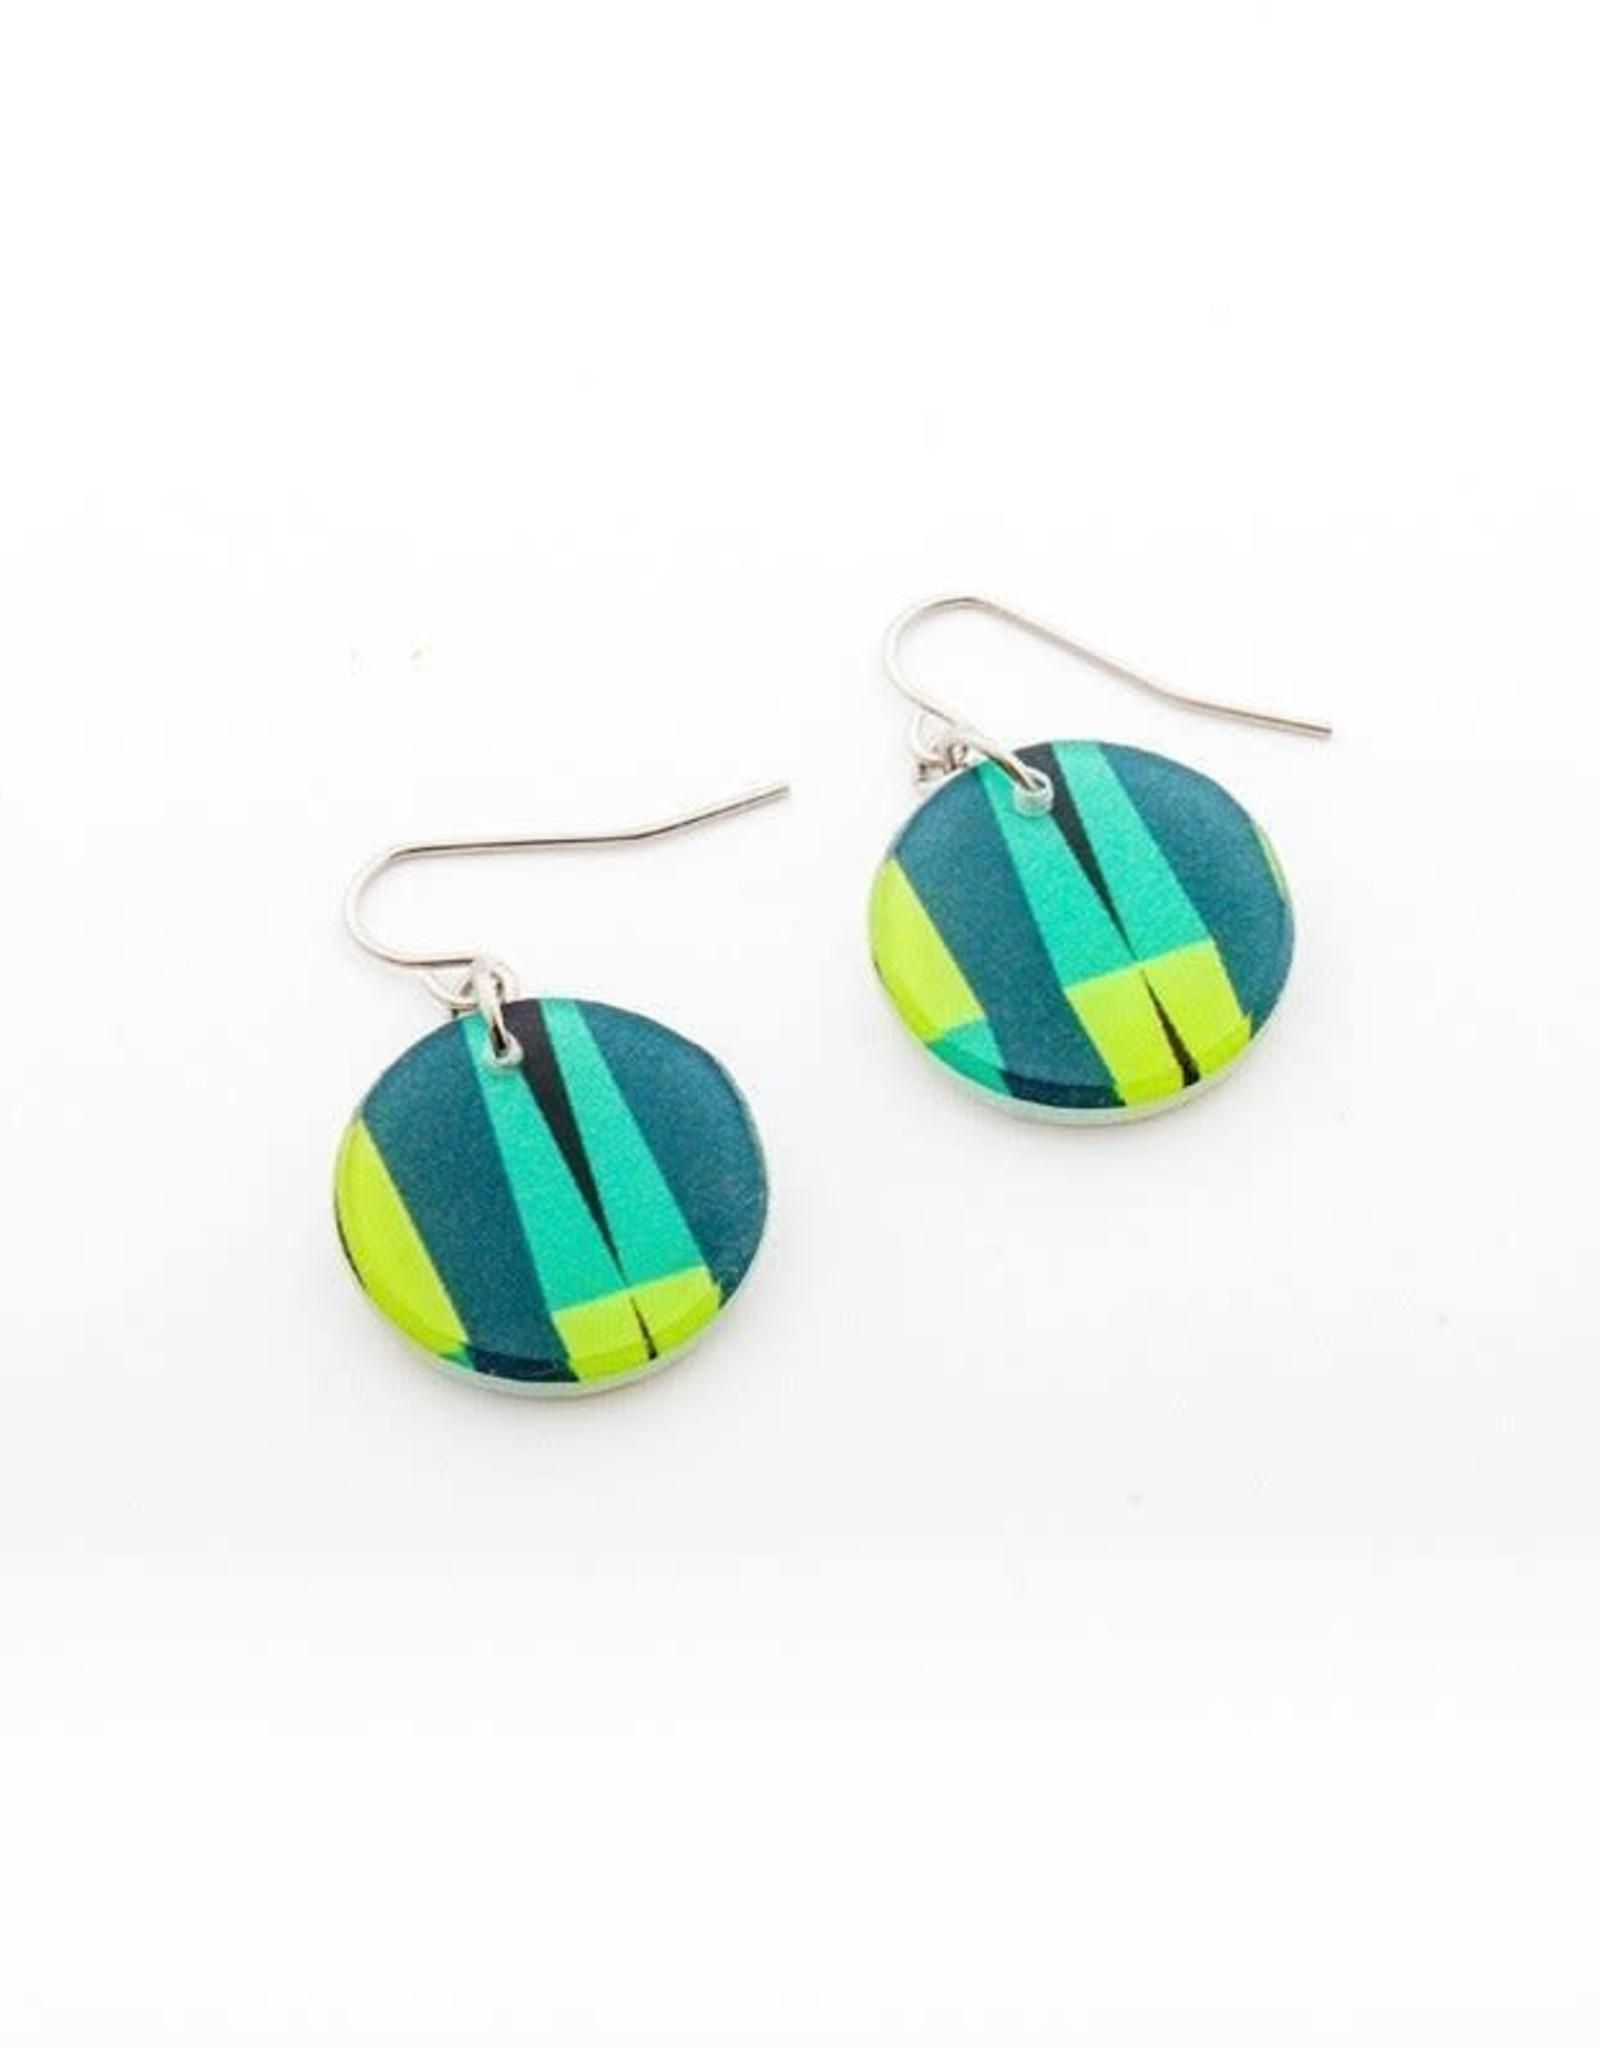 Dconstruct Dconstruct  Eco-resin Earrings - Assorted